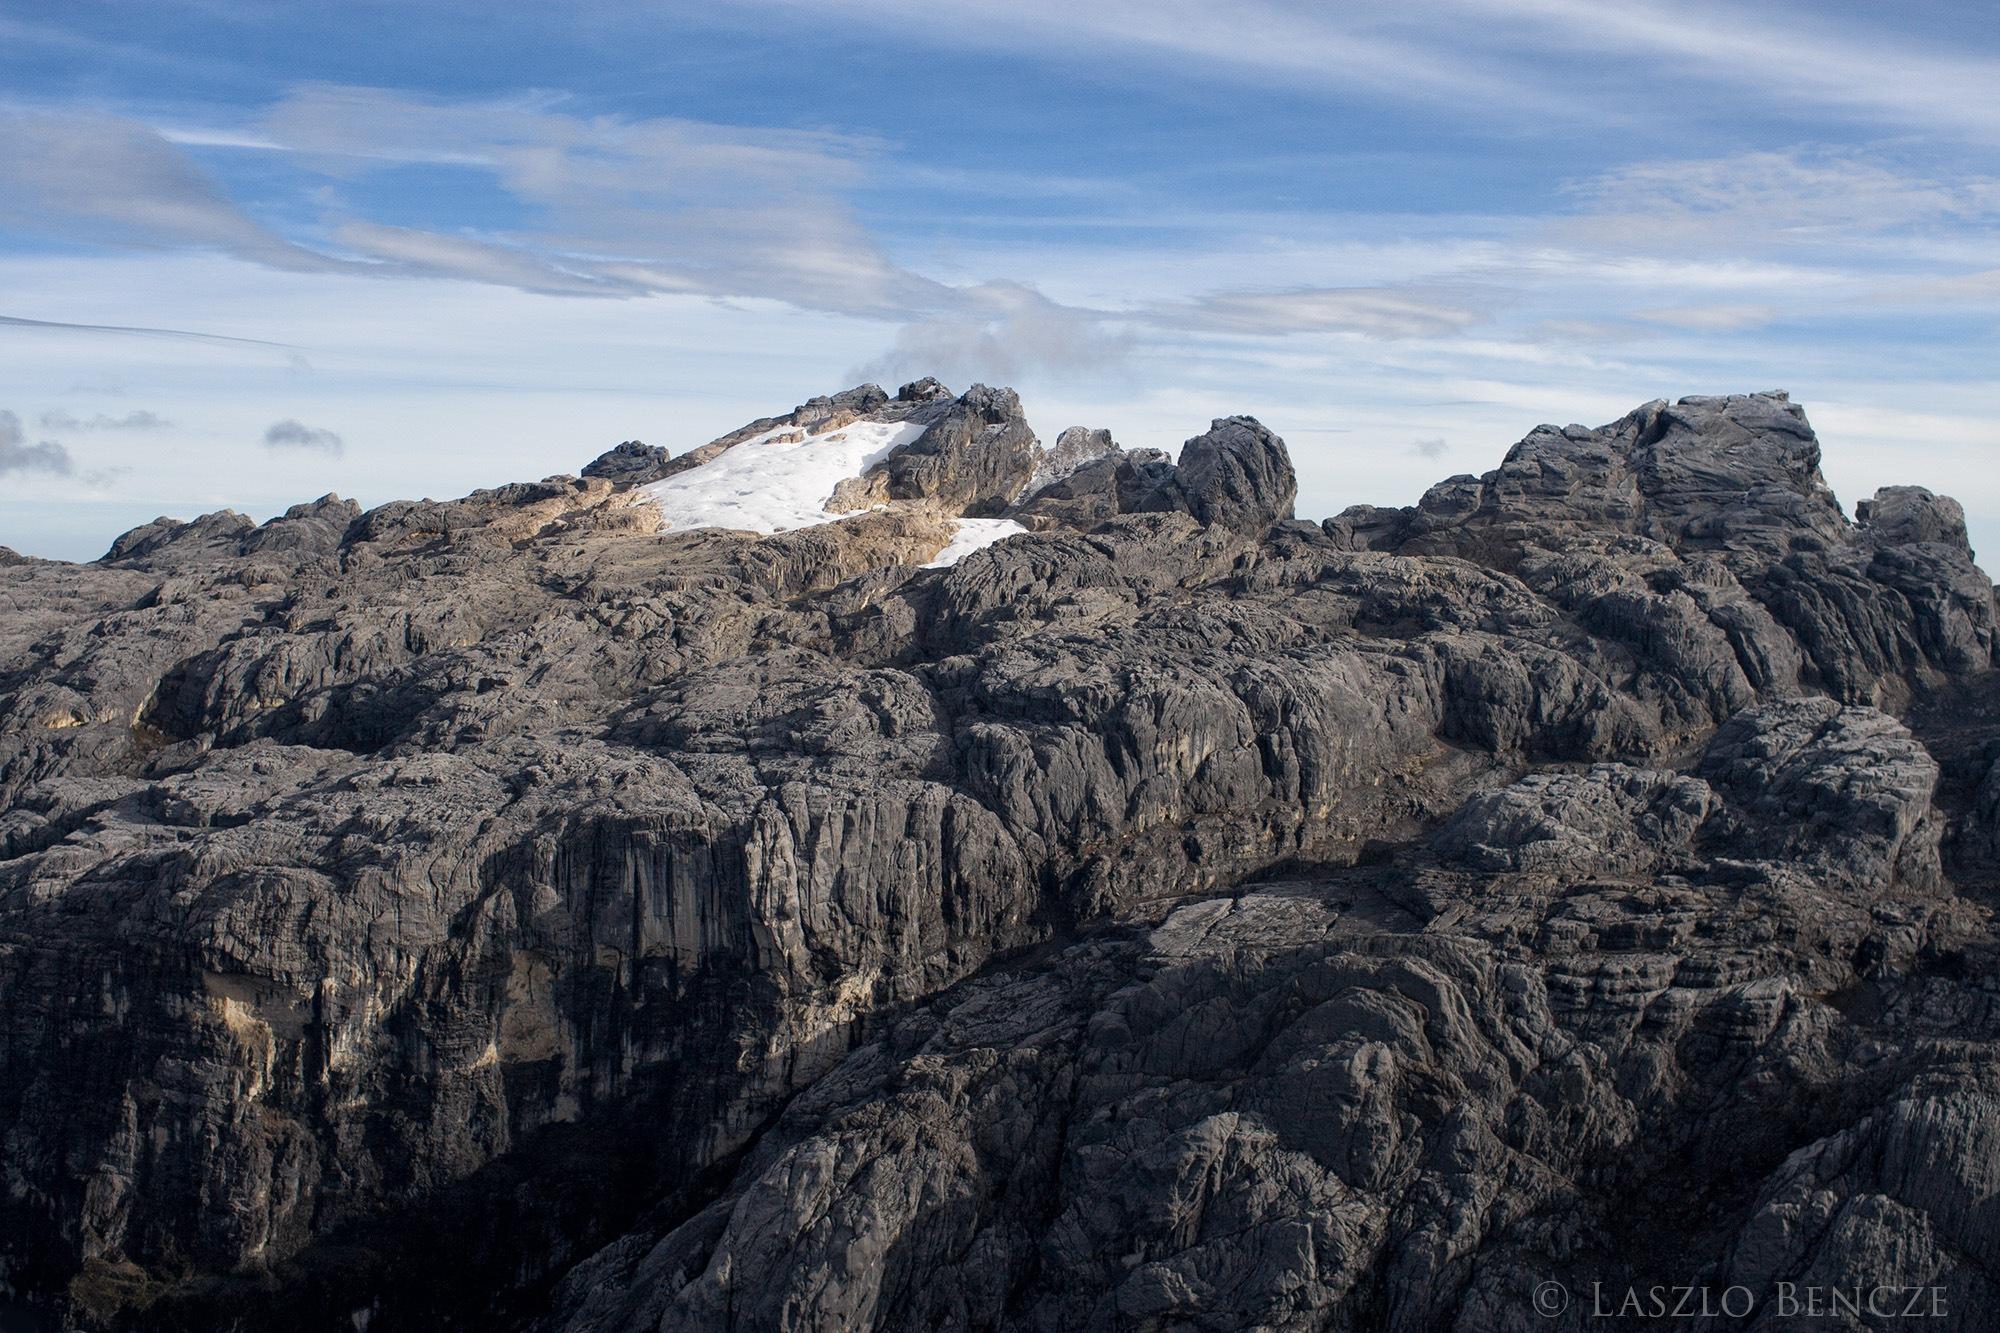 Glacier Near Grasberg Mine by Laszlo Bencze